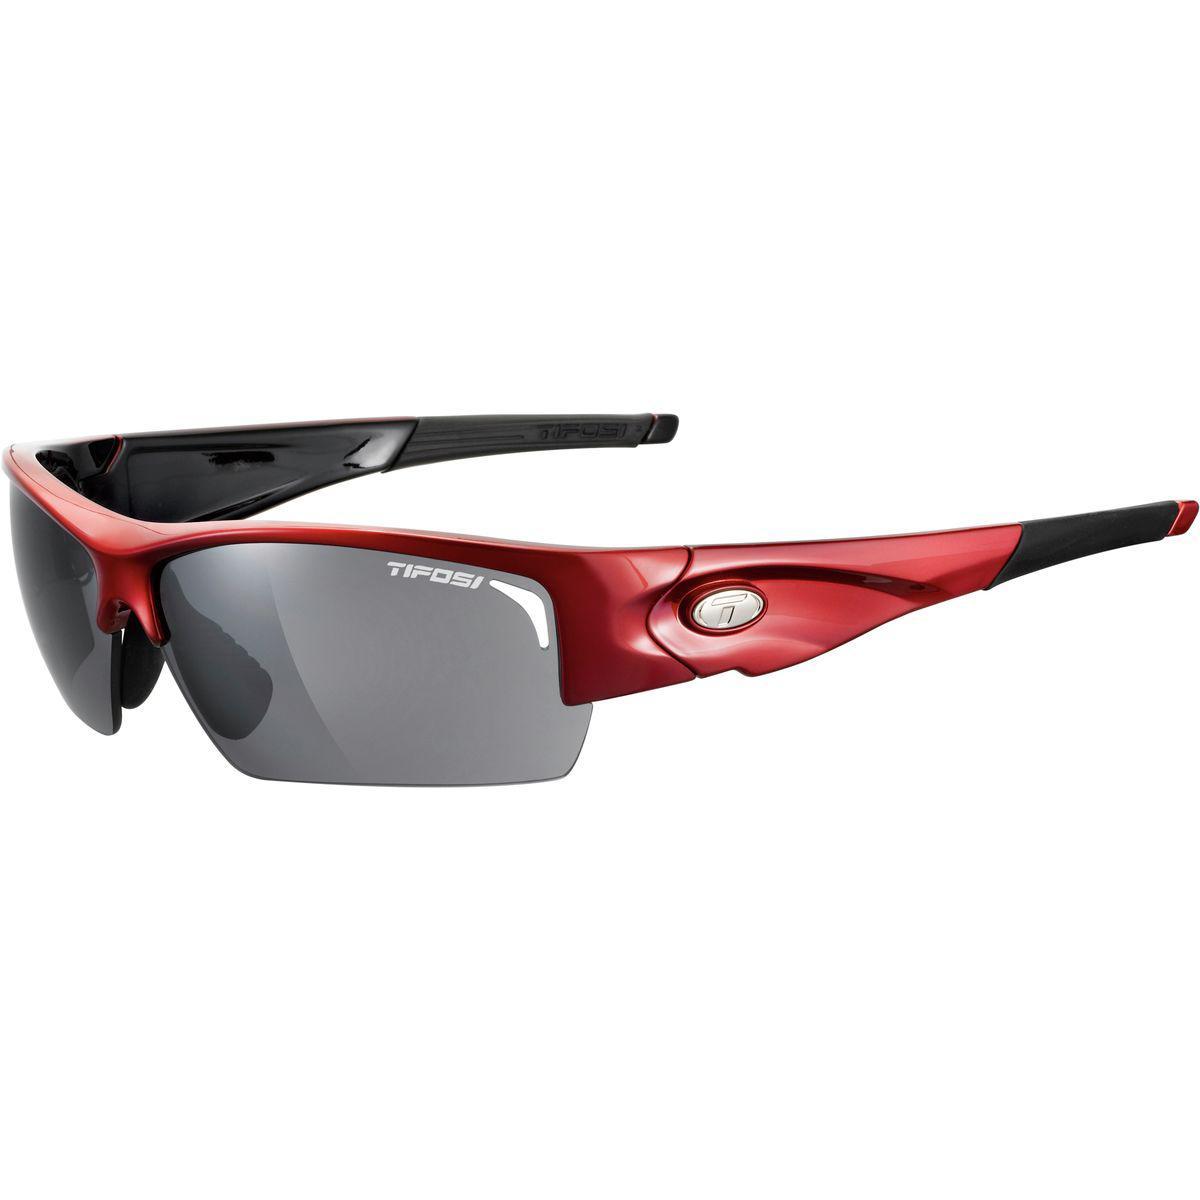 2acc74f25b Lyst - Tifosi Optics Lore Sunglasses in Red for Men